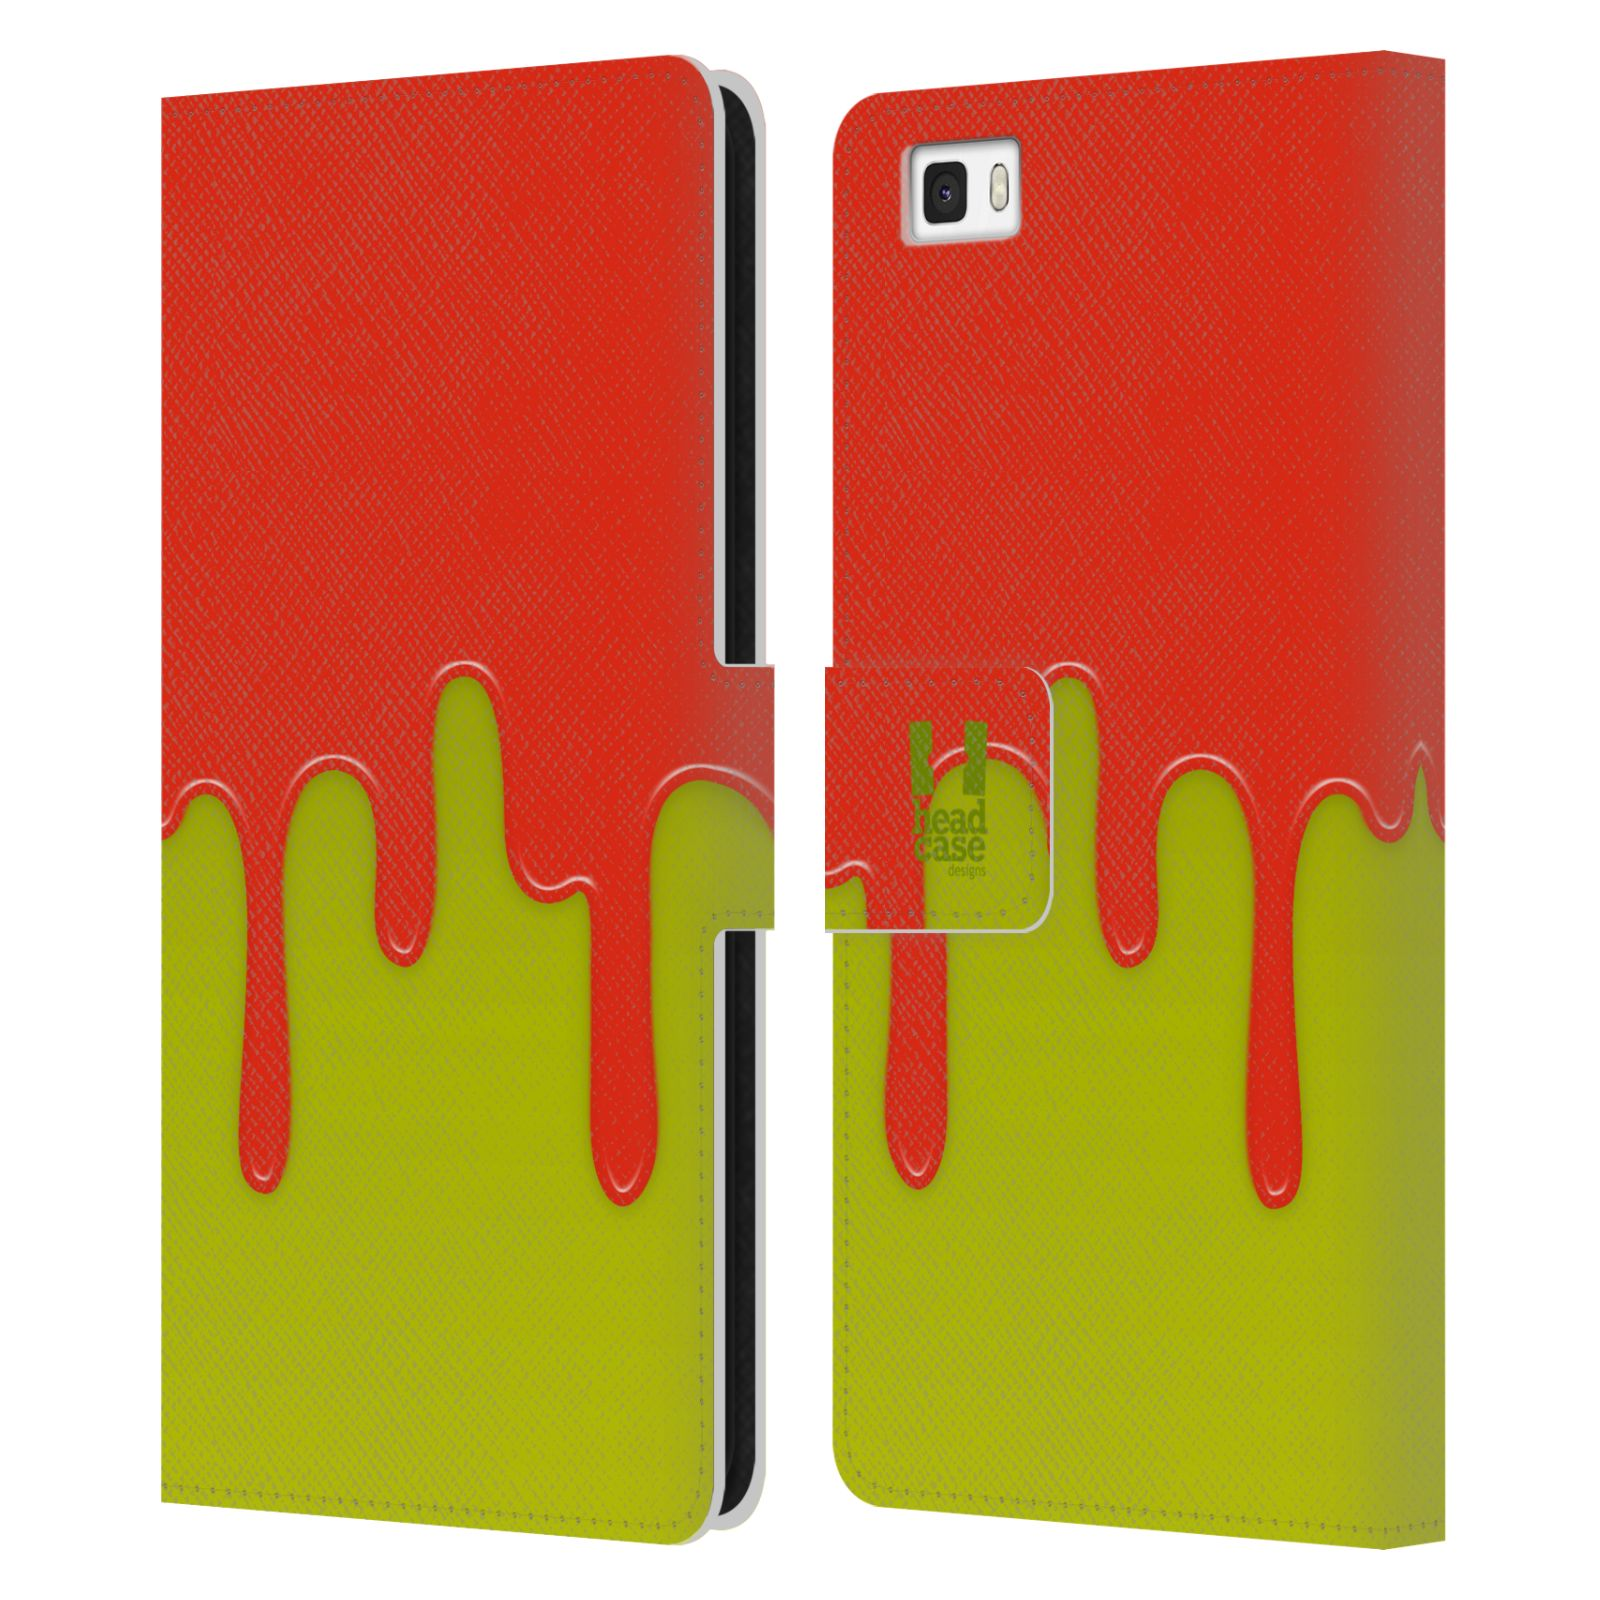 HEAD CASE Flipové pouzdro pro mobil Huawei P8 LITE Rozlitá barva oranžová a zelená